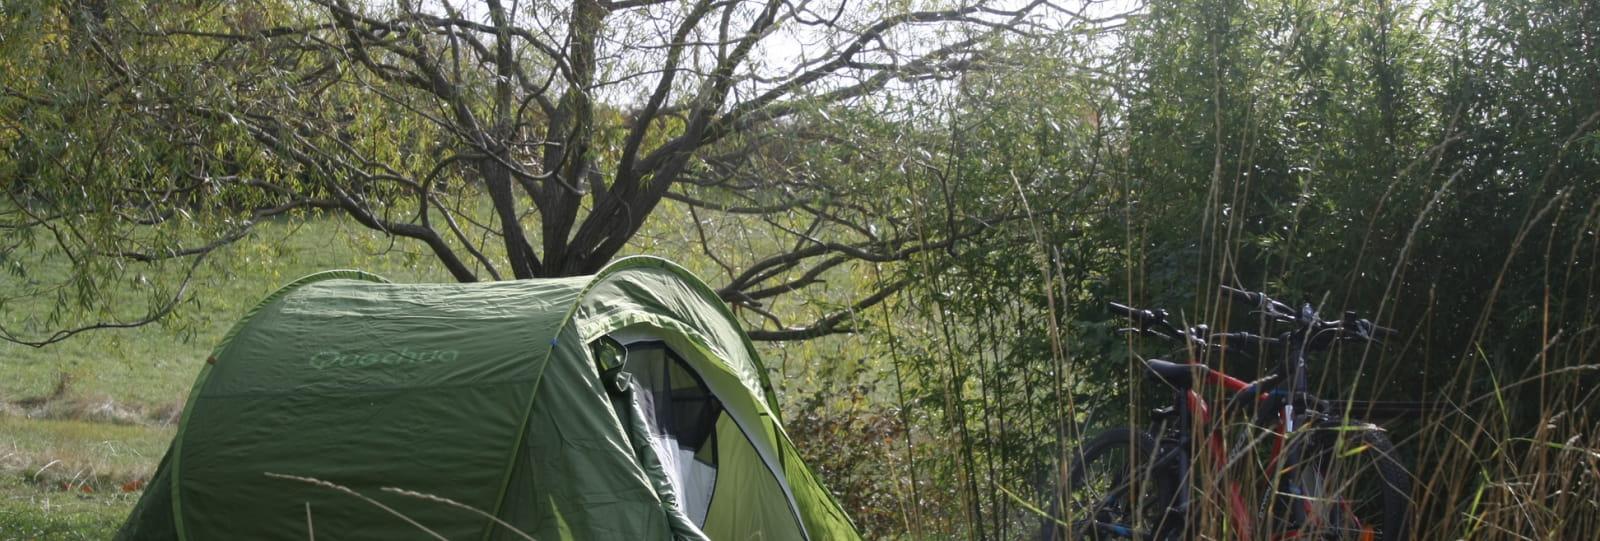 Camping Domaine la Belle Verte